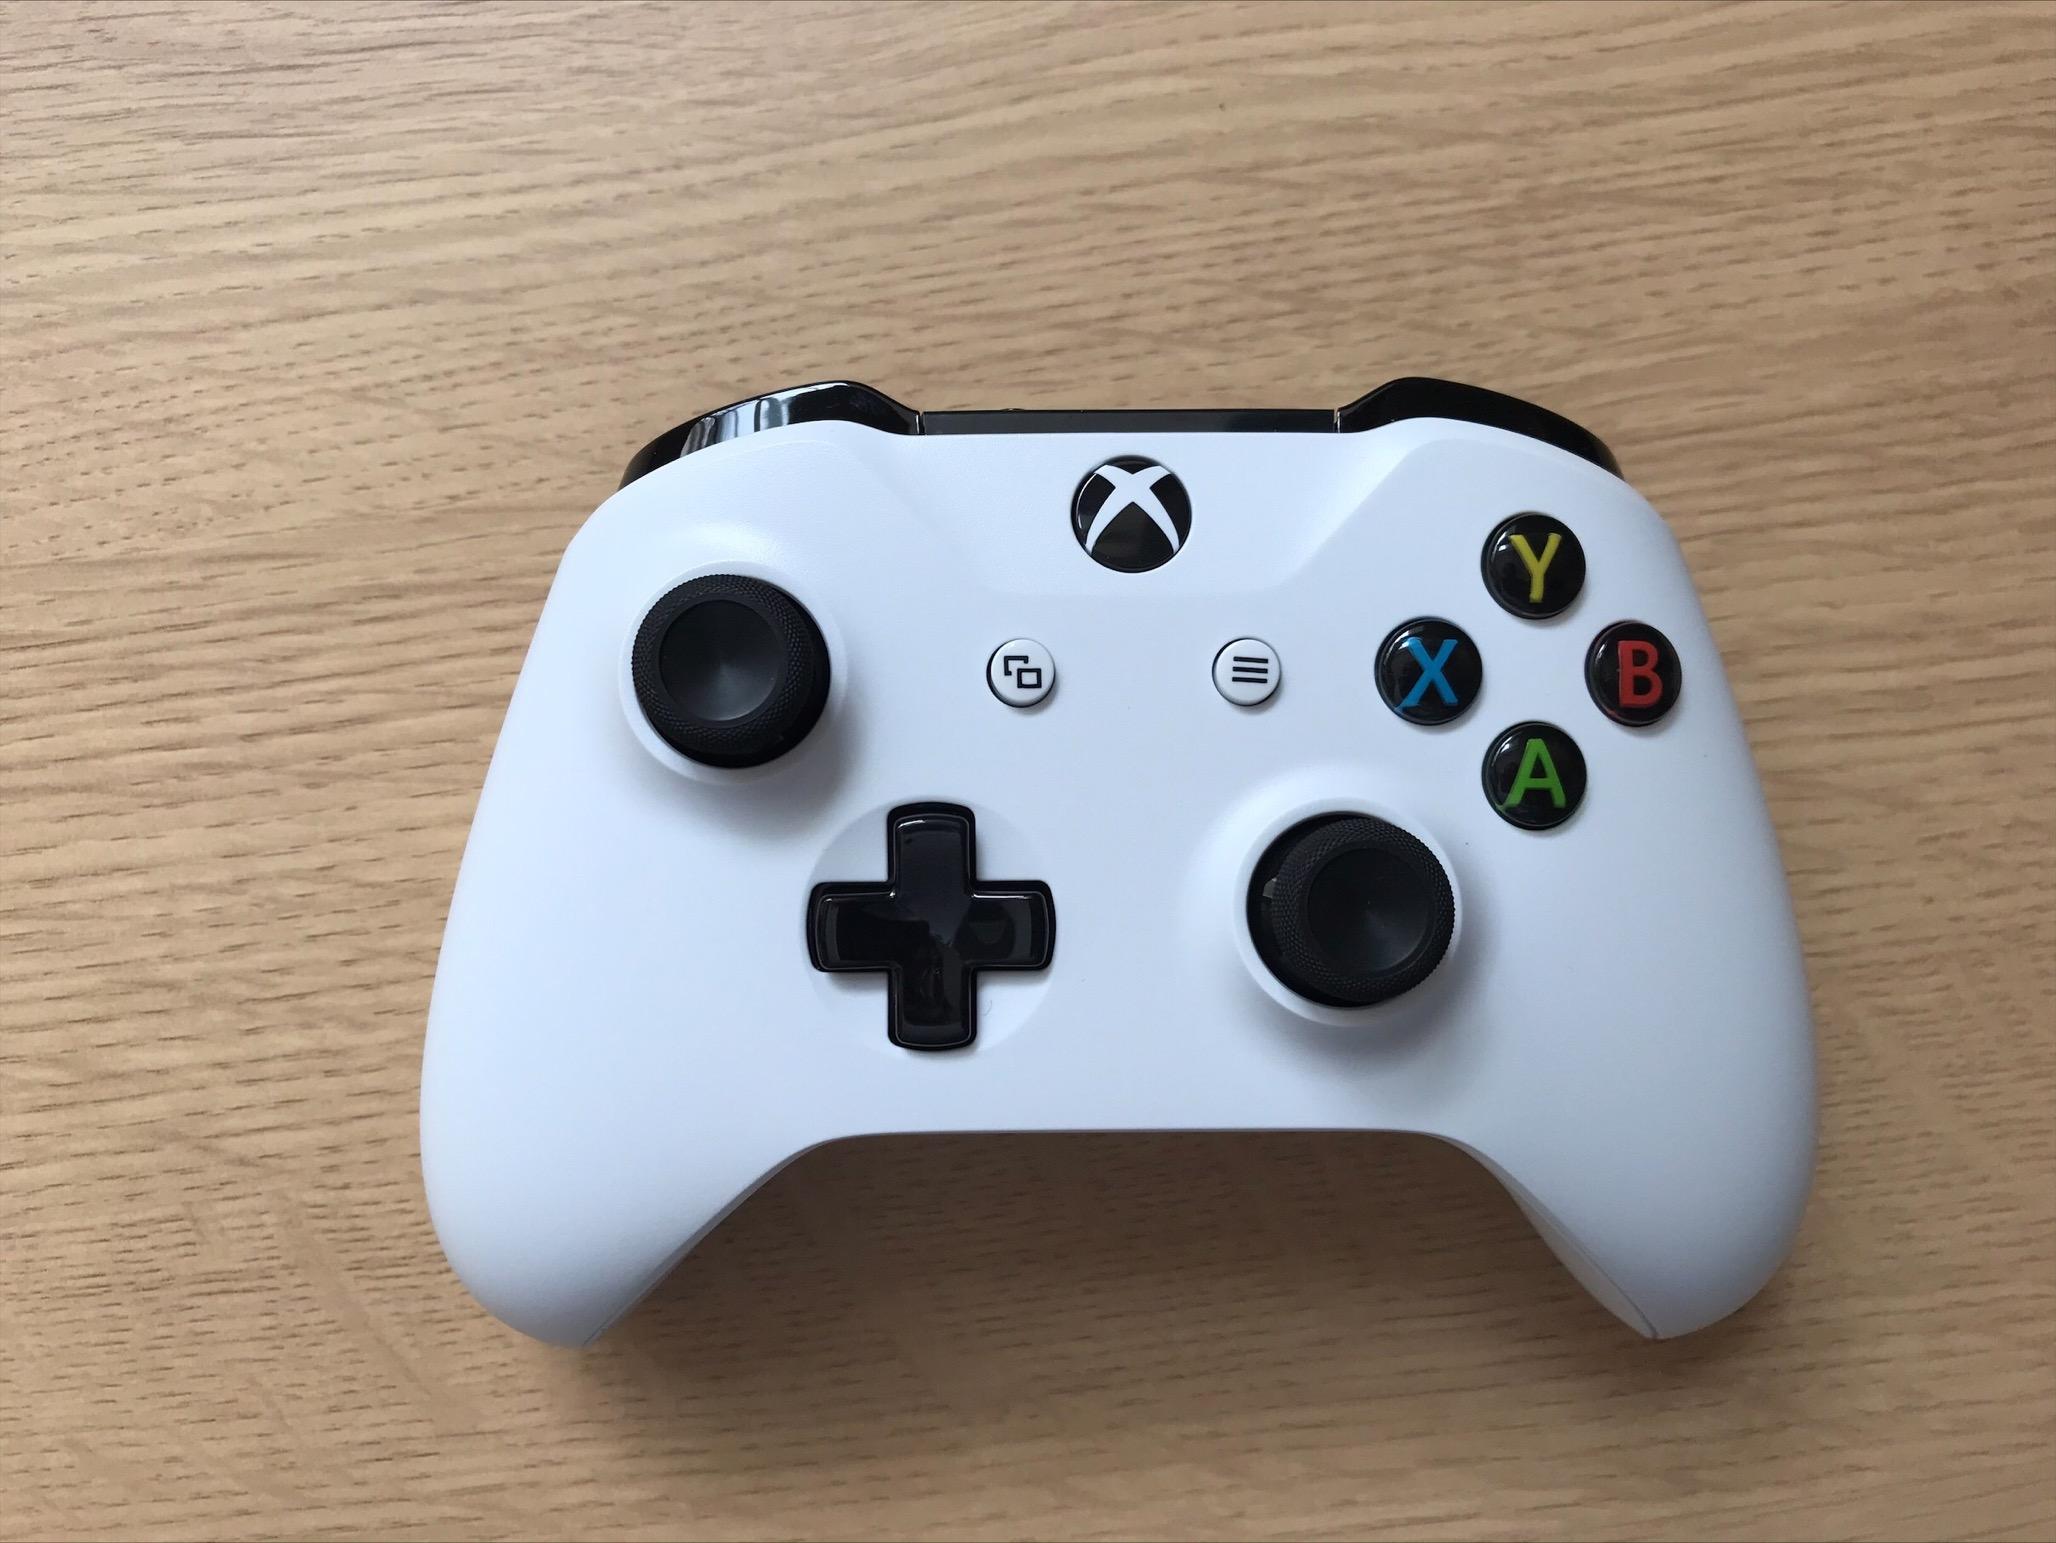 A Lightweight Xbox One controller